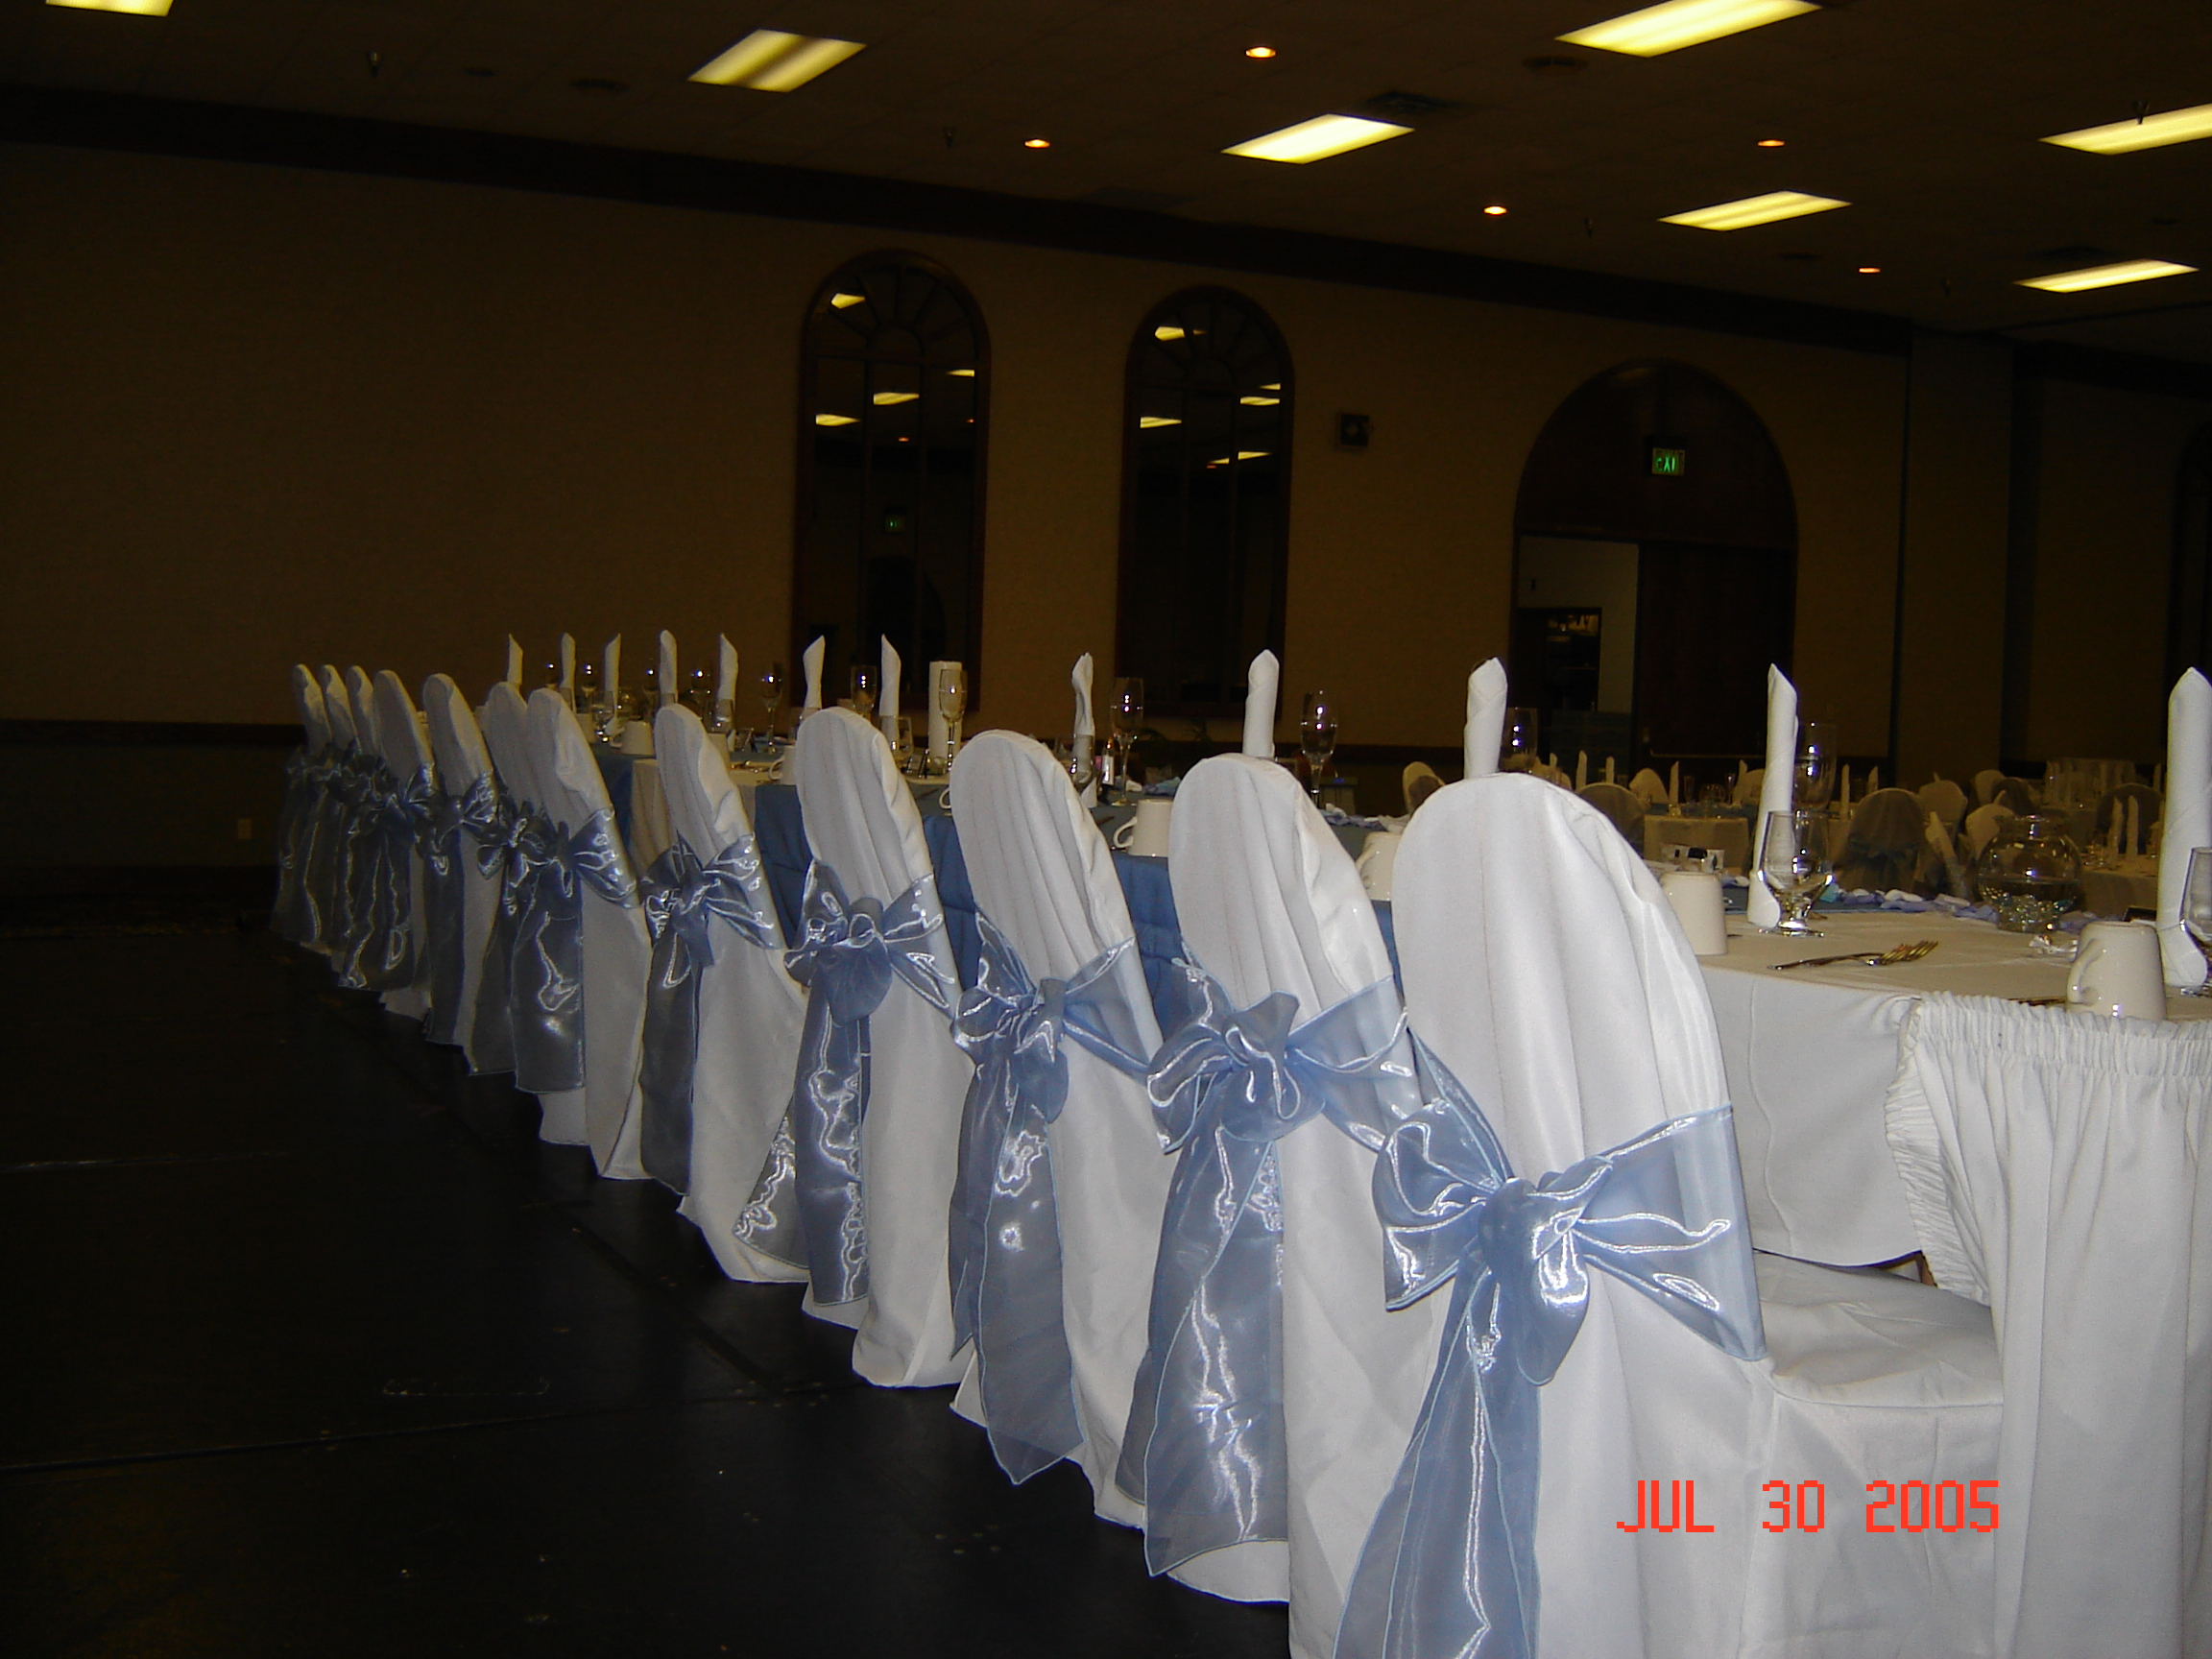 chair cover rentals dallas texas cheap plastic adirondack chairs home depot simply elegant weddings wedding